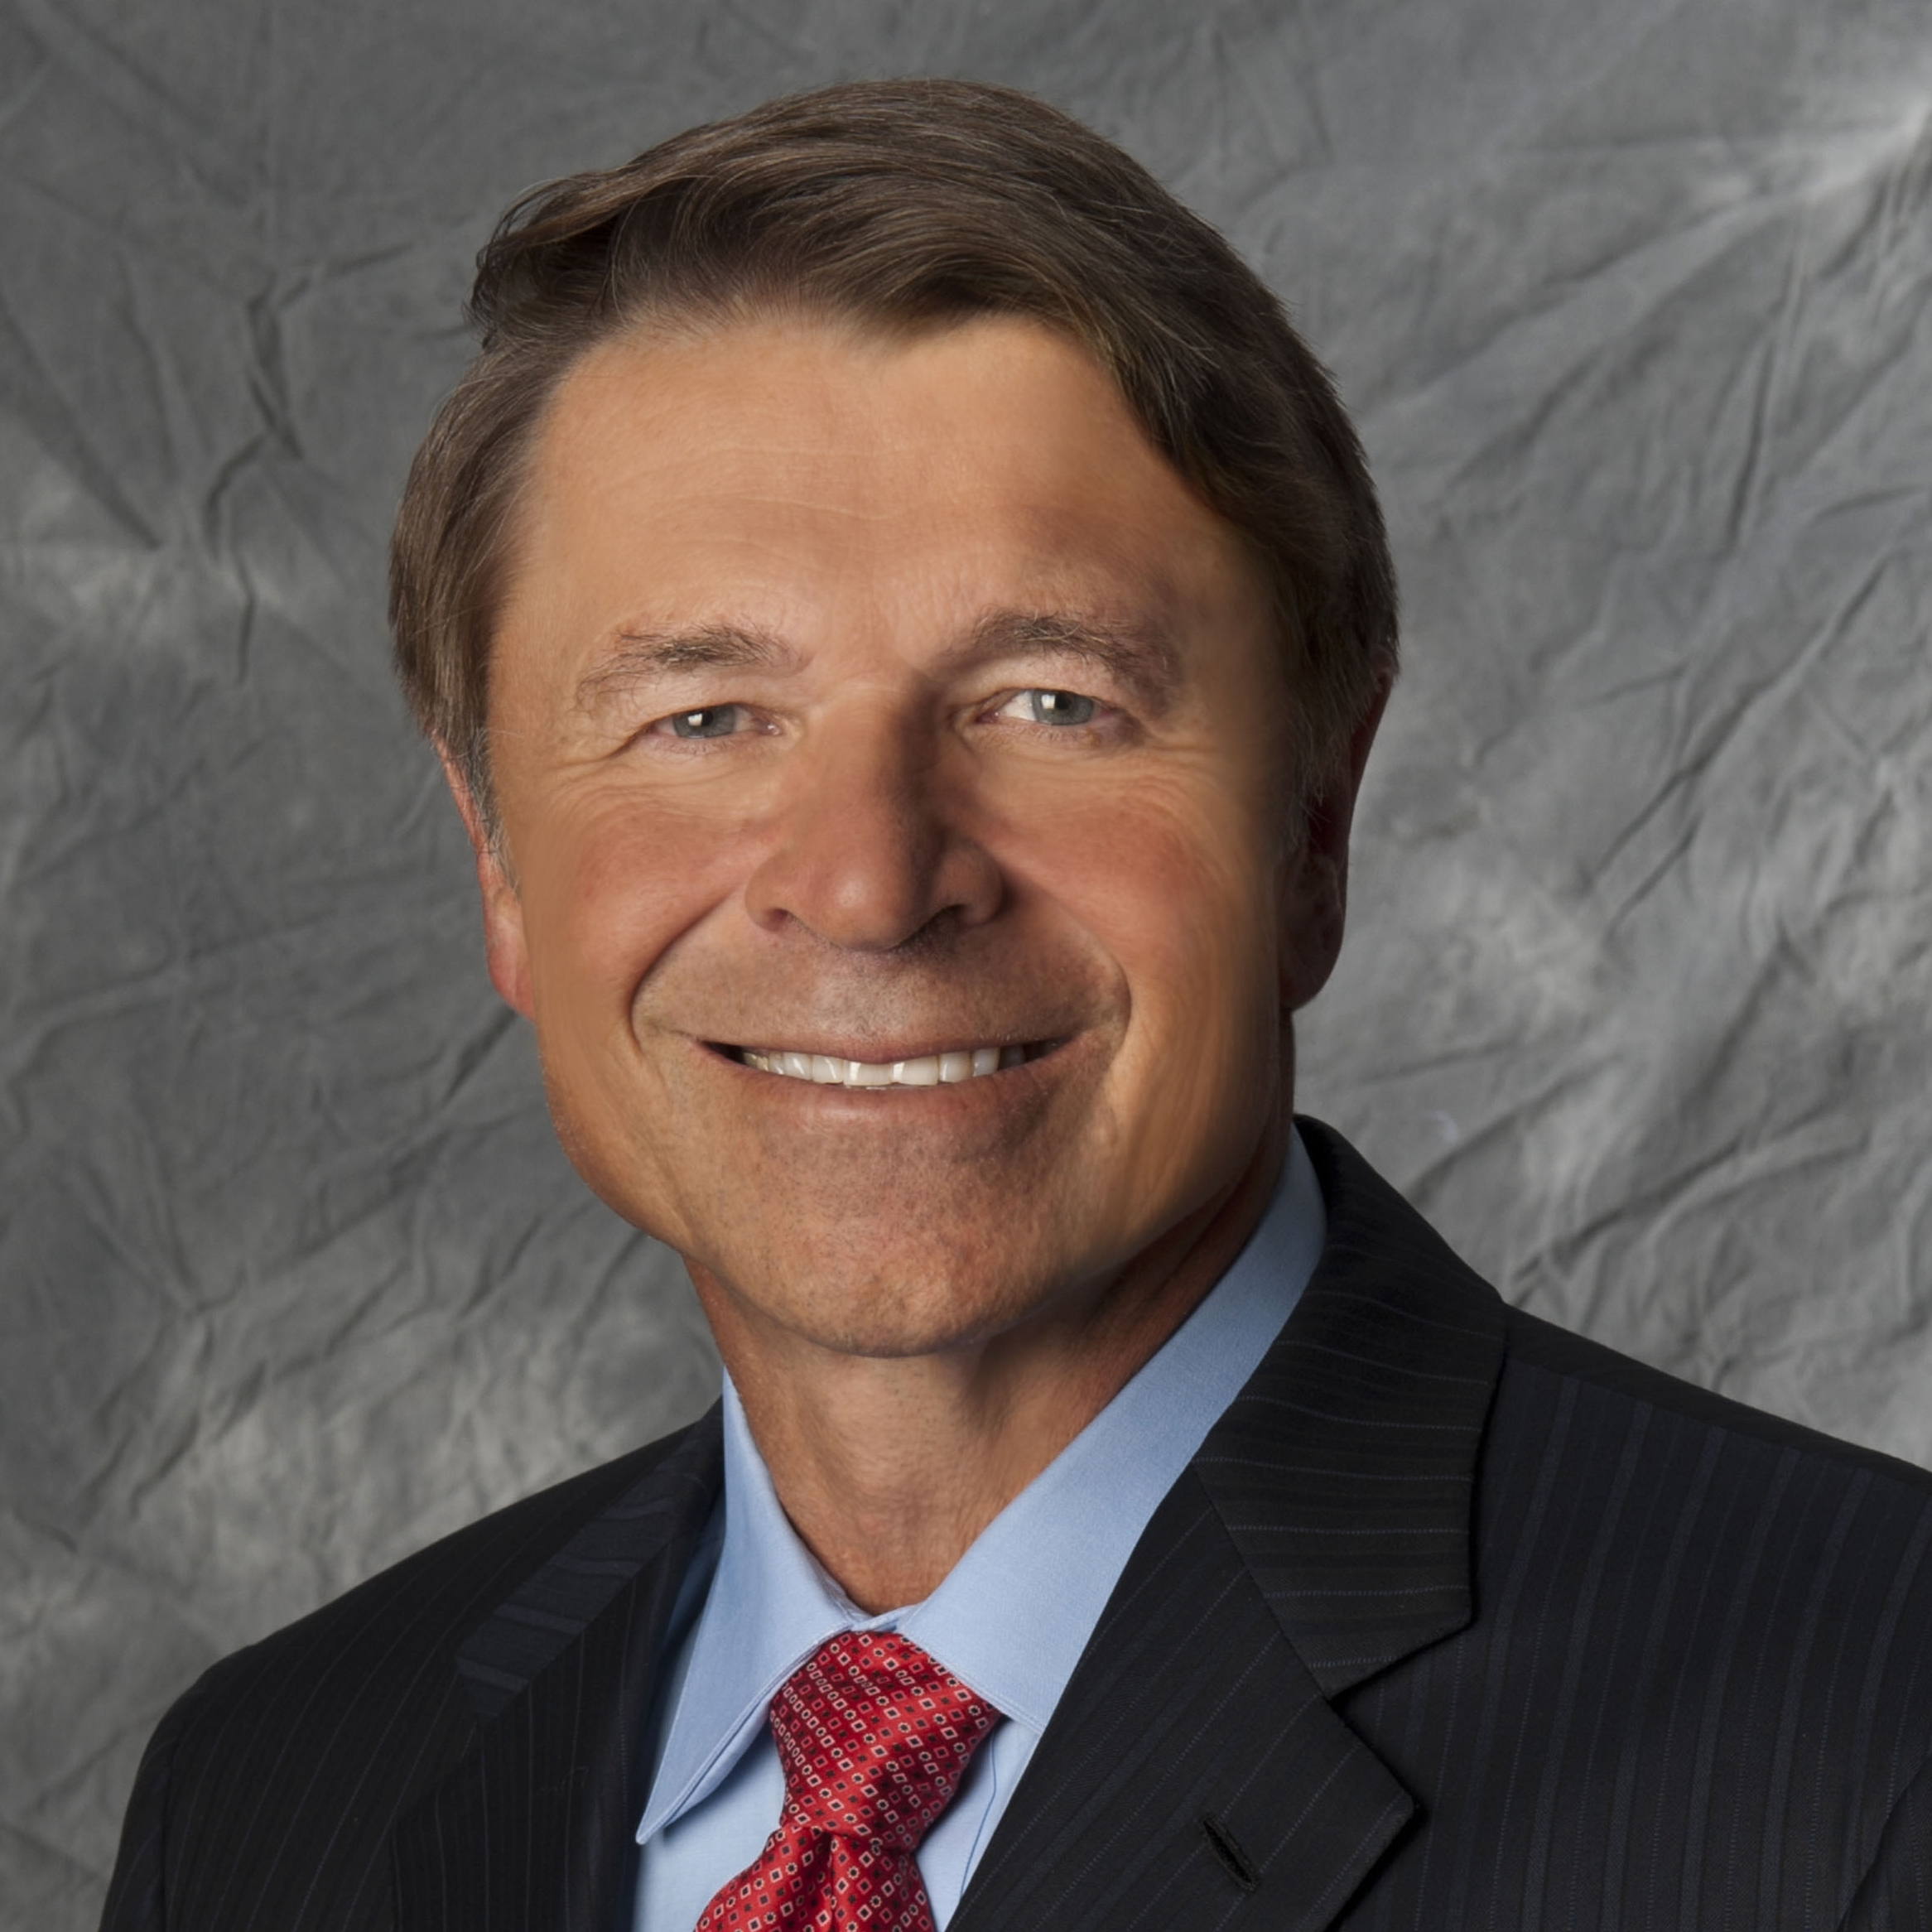 David Novak - Co-Founder, Retired Chairman & CEO of Yum! Brands, Inc.